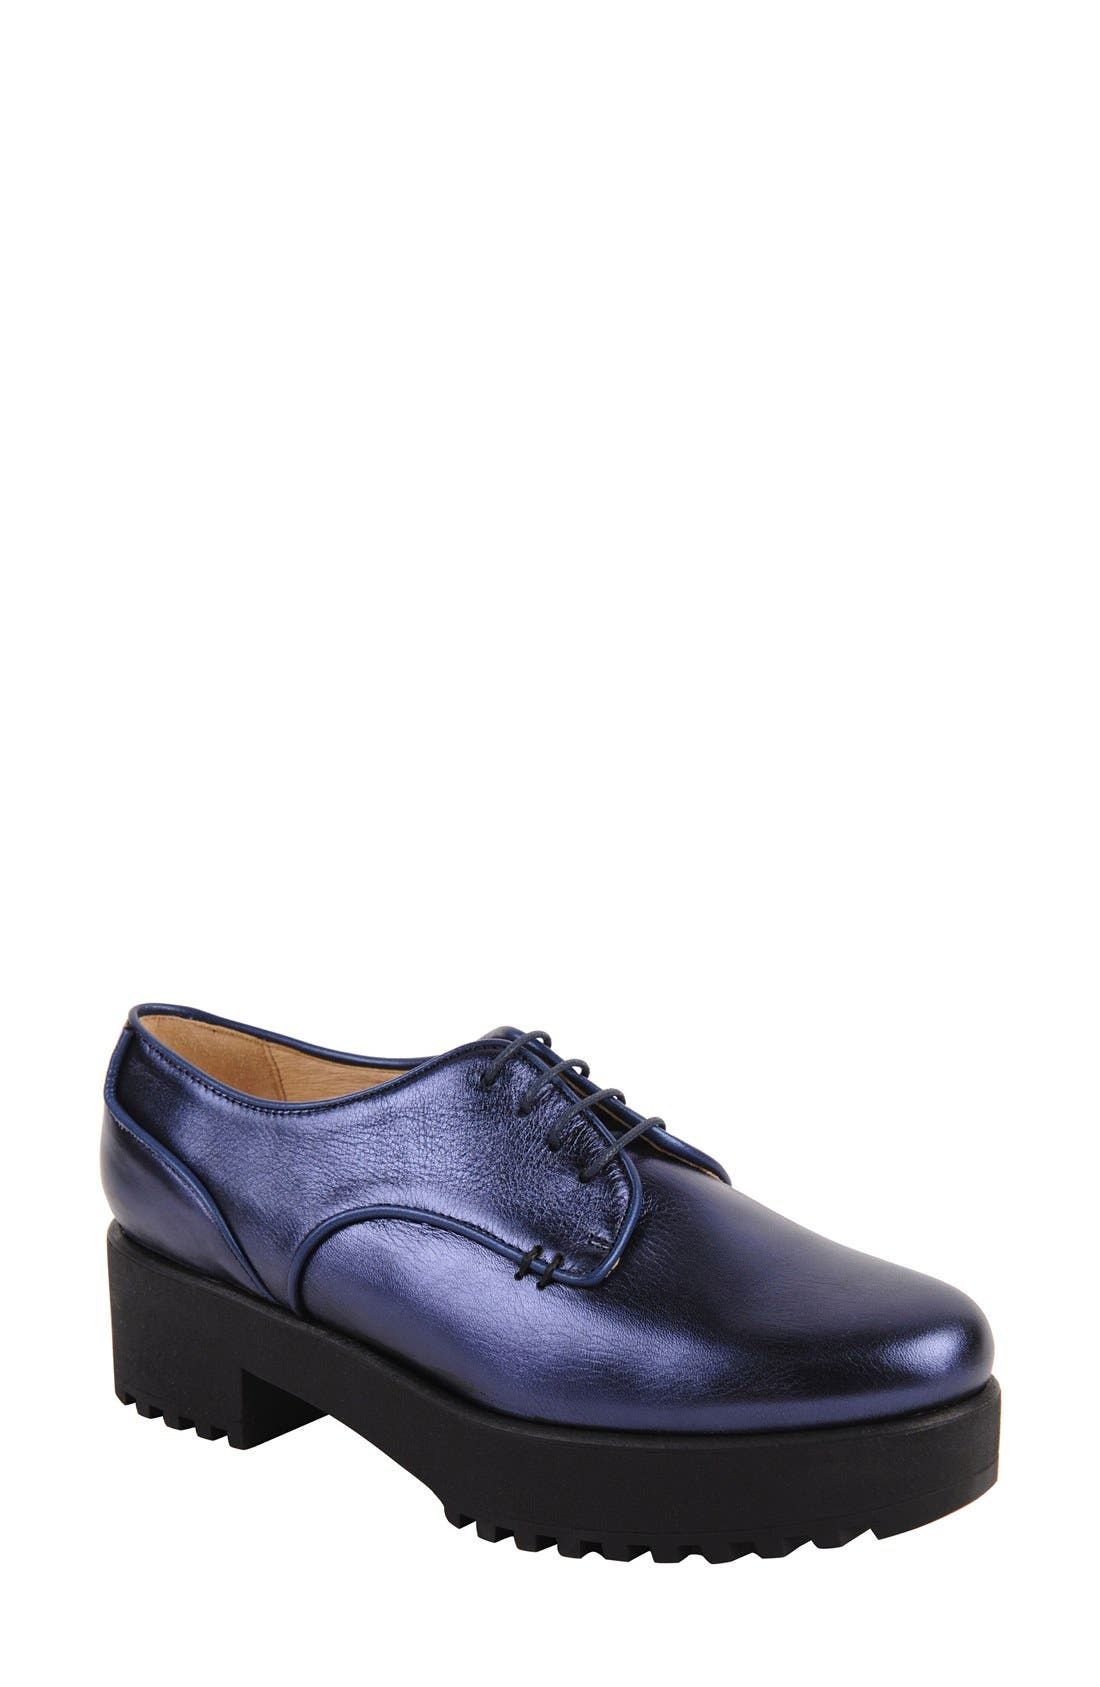 Ukies Andrea Lug Oxford- Blue